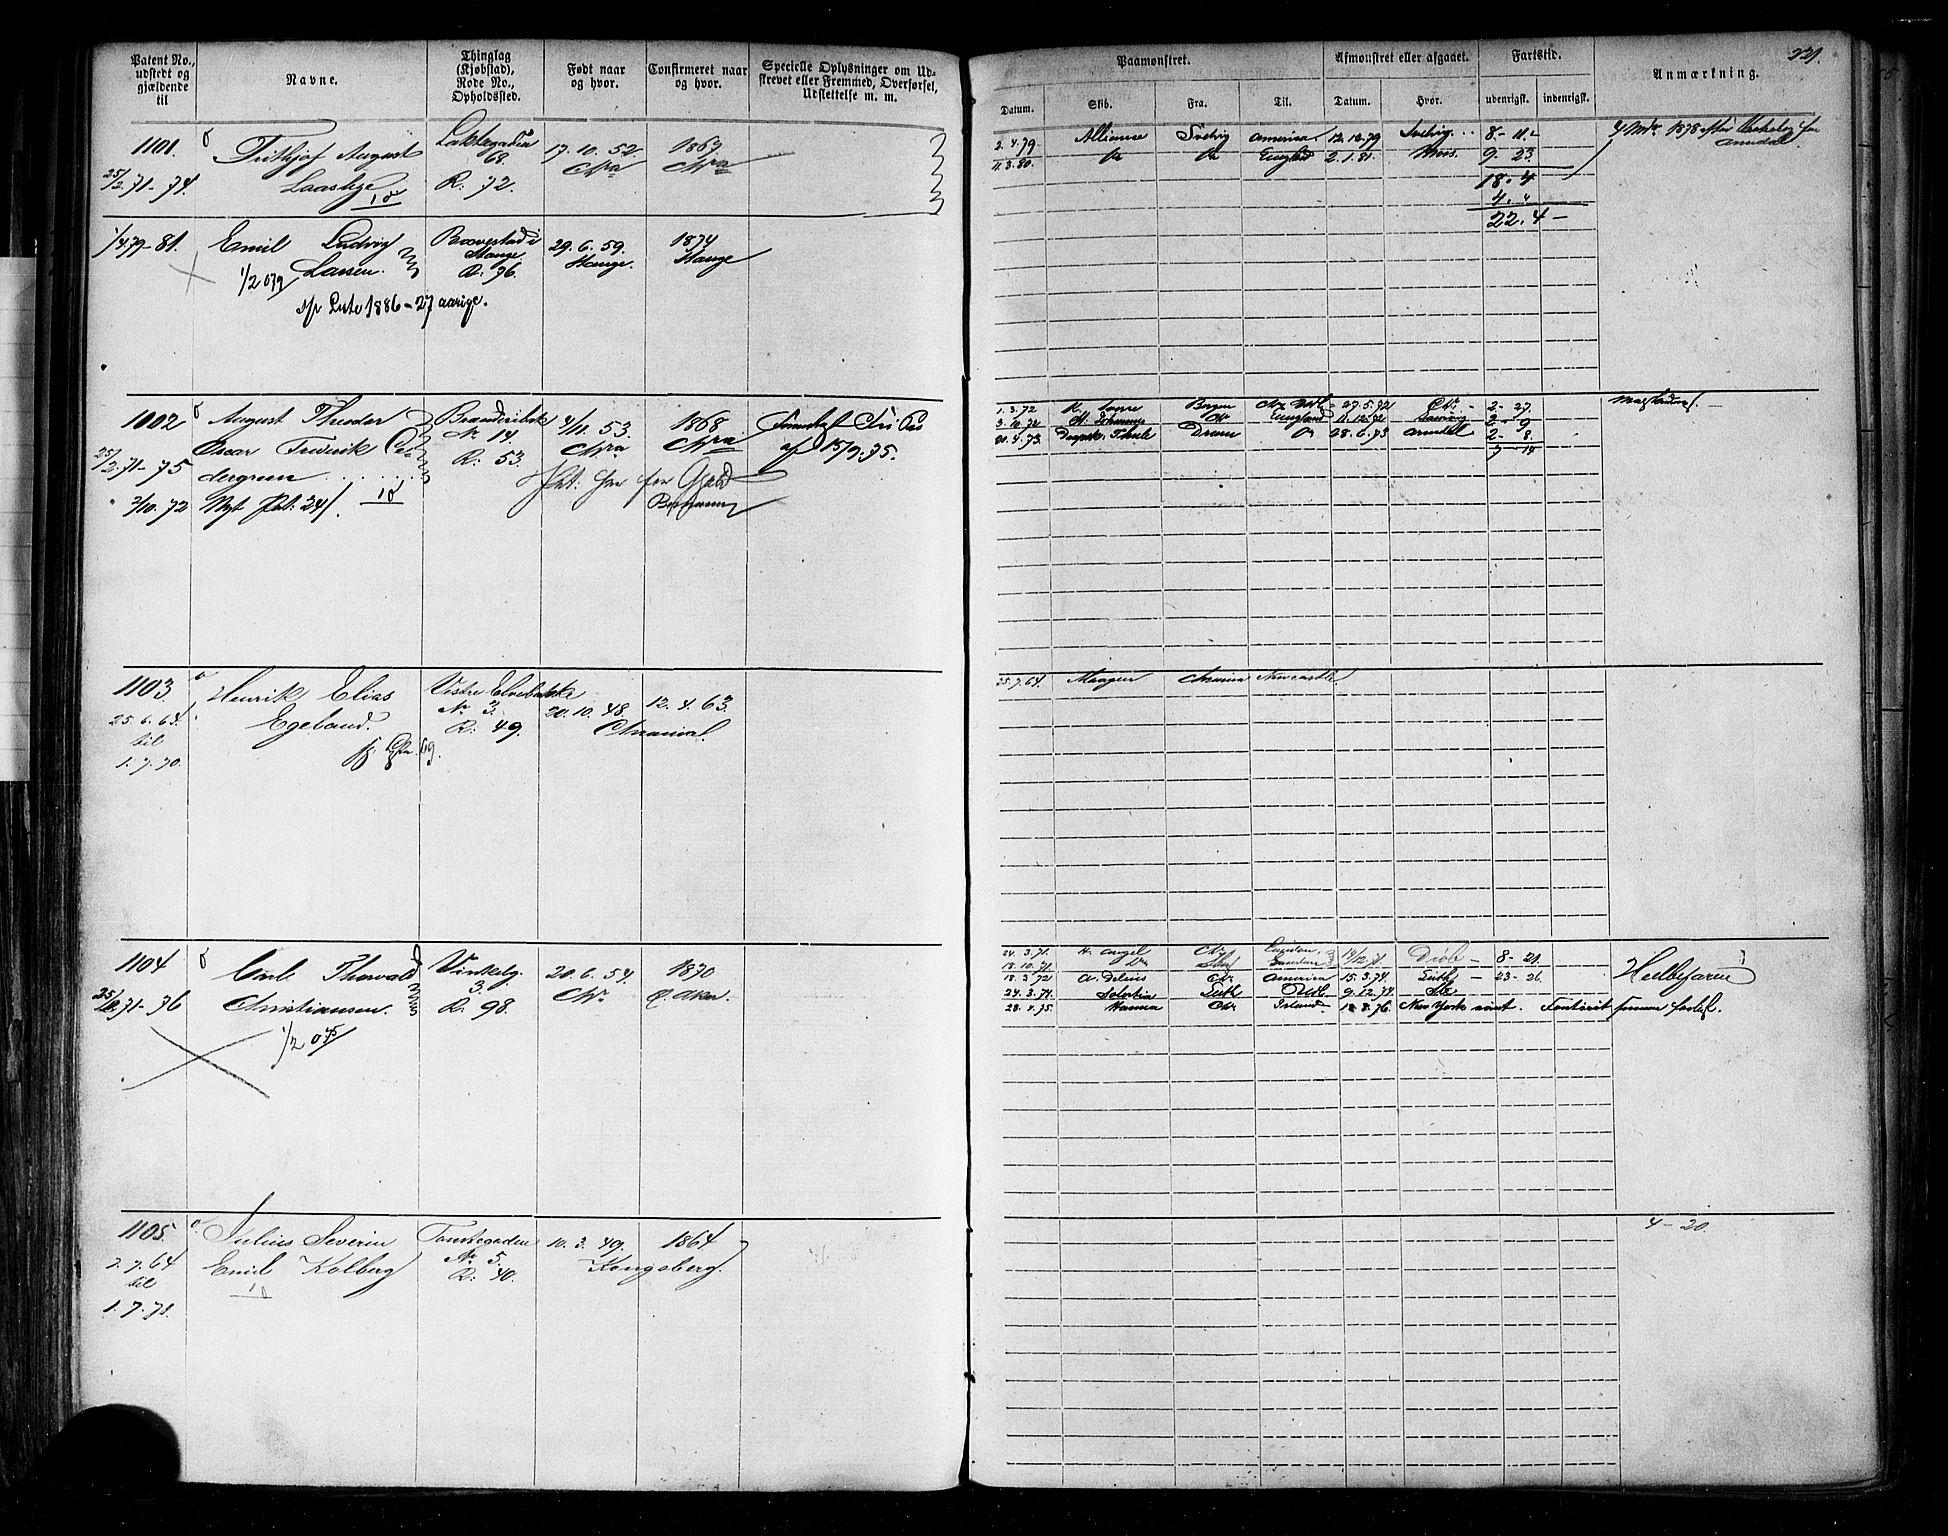 SAO, Oslo mønstringskontor, F/Fc/Fca/L0001: Annotasjonsrulle, 1866-1881, s. 220b-221a